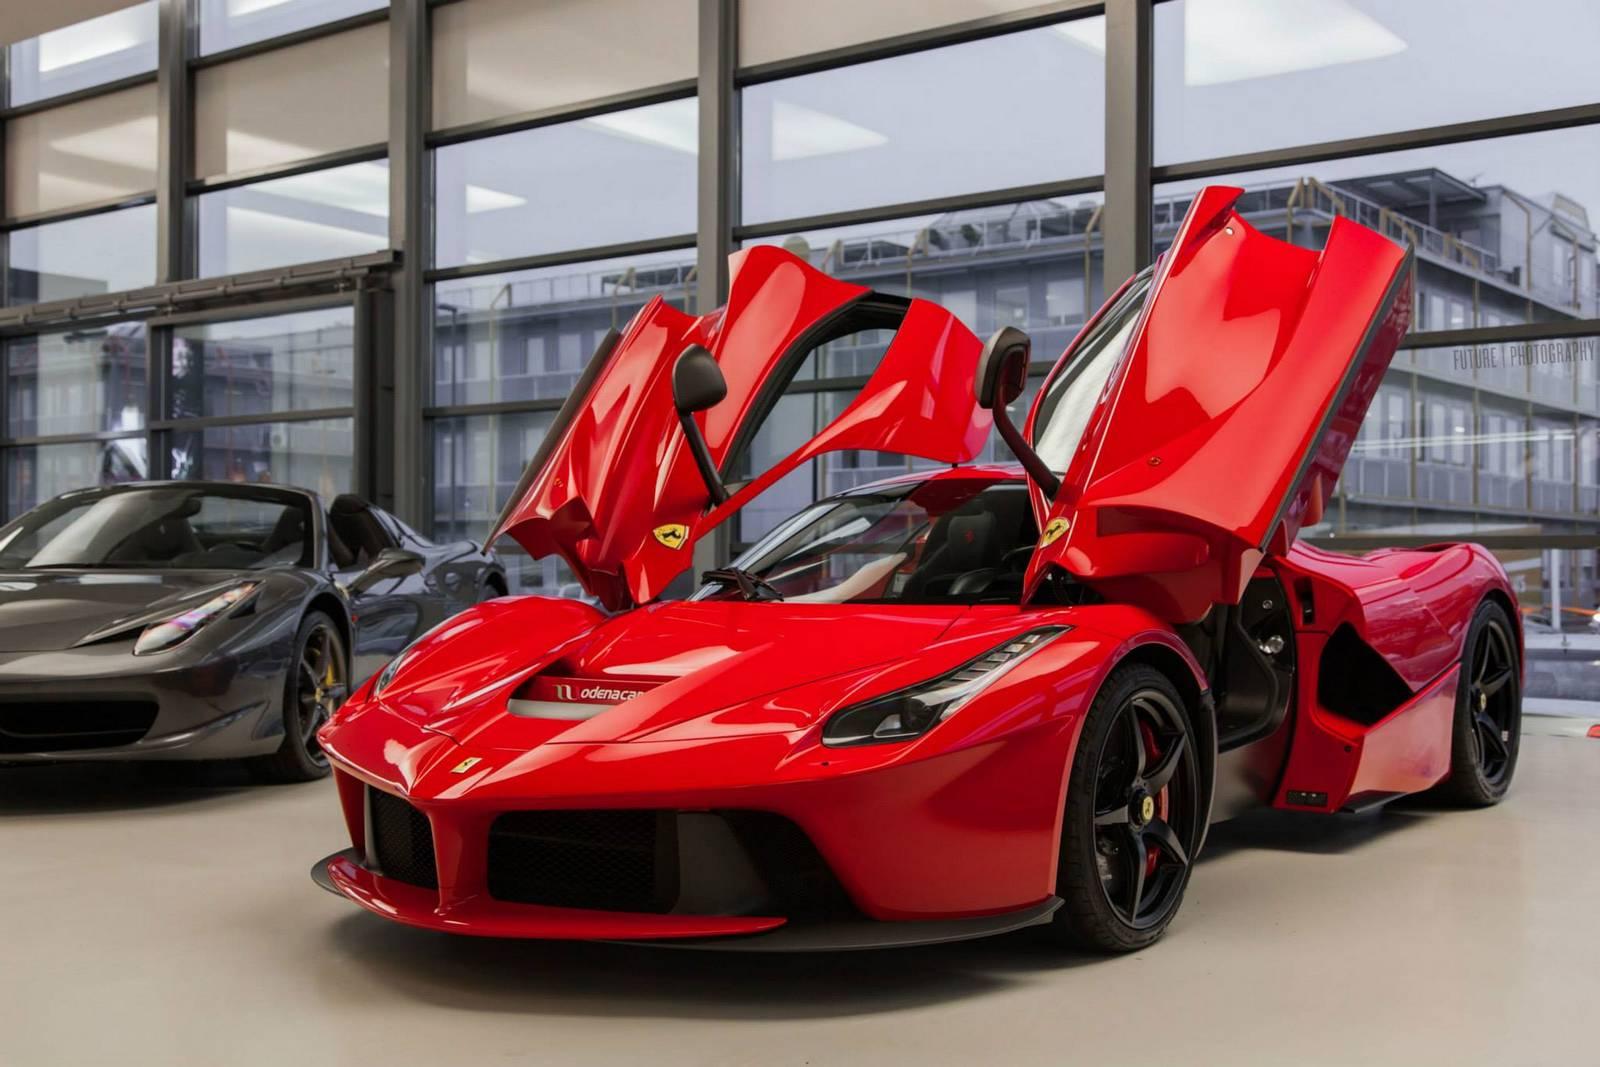 [Image: Ferrari-LaFerrari-9.jpg]